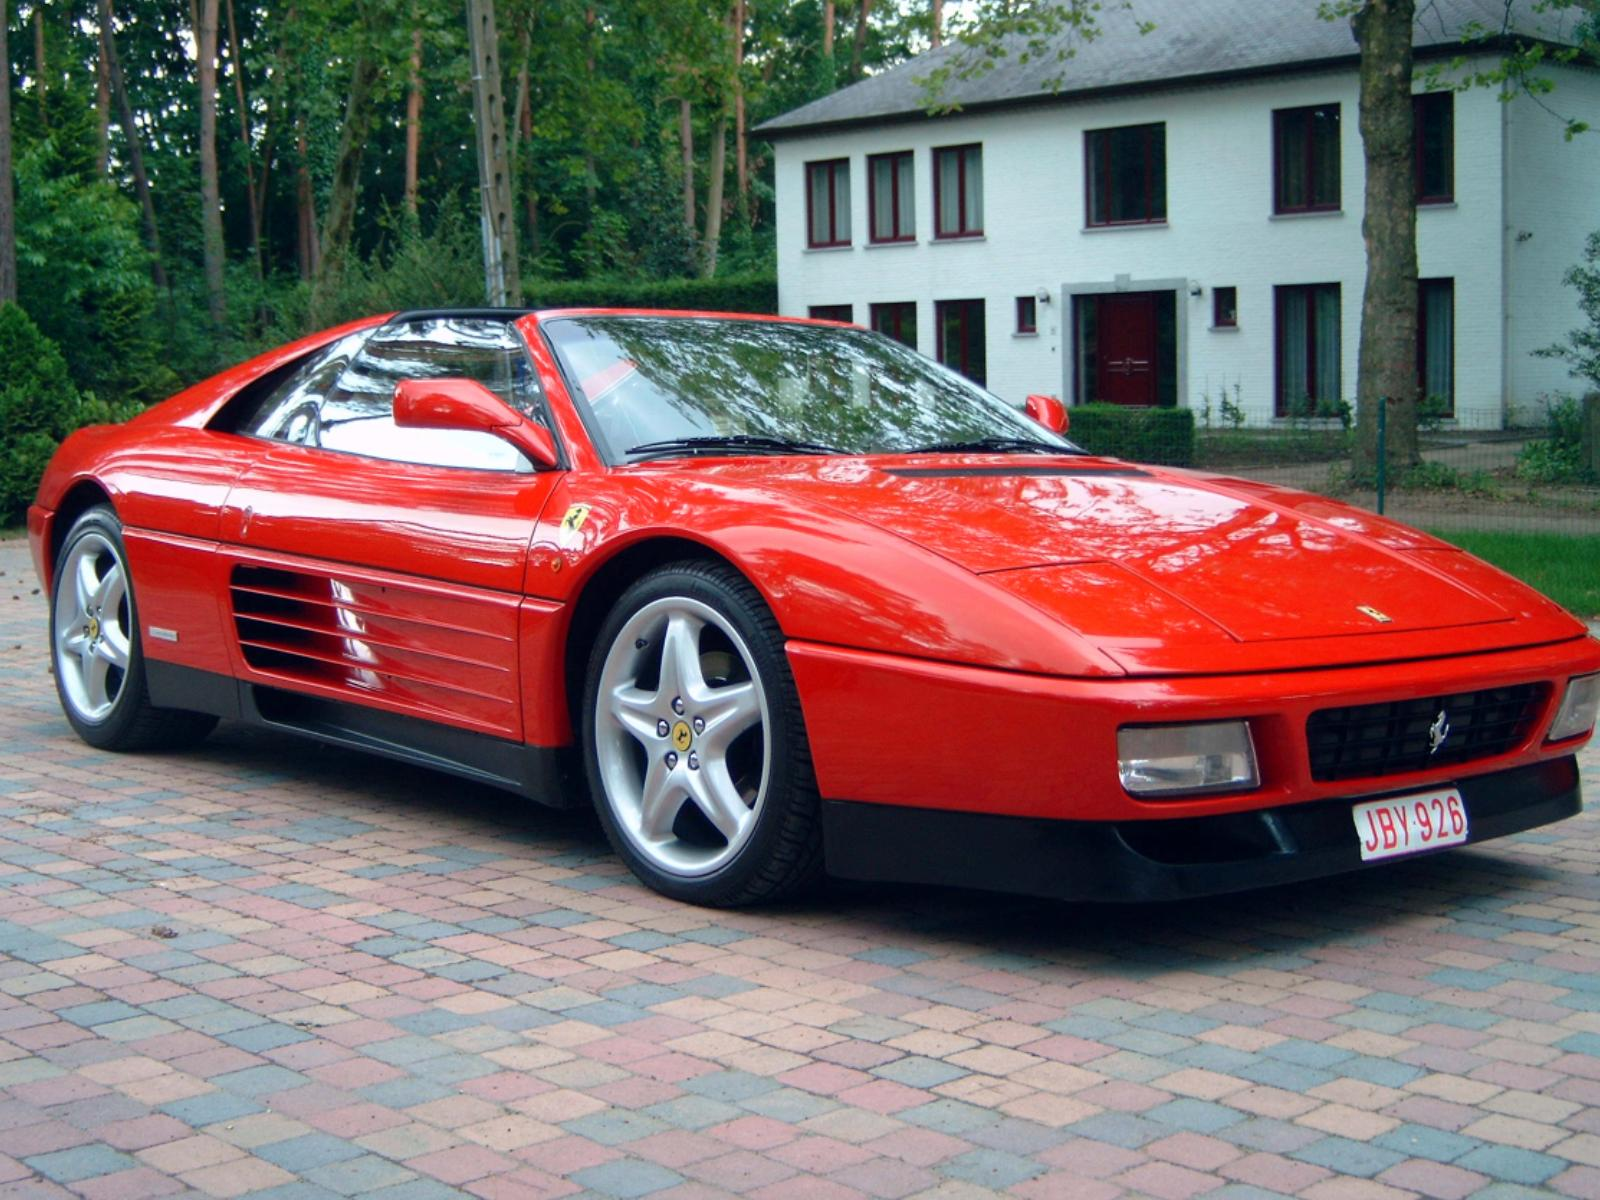 Ferrari 348 Ts Photos Photogallery With 6 Pics Carsbase Com